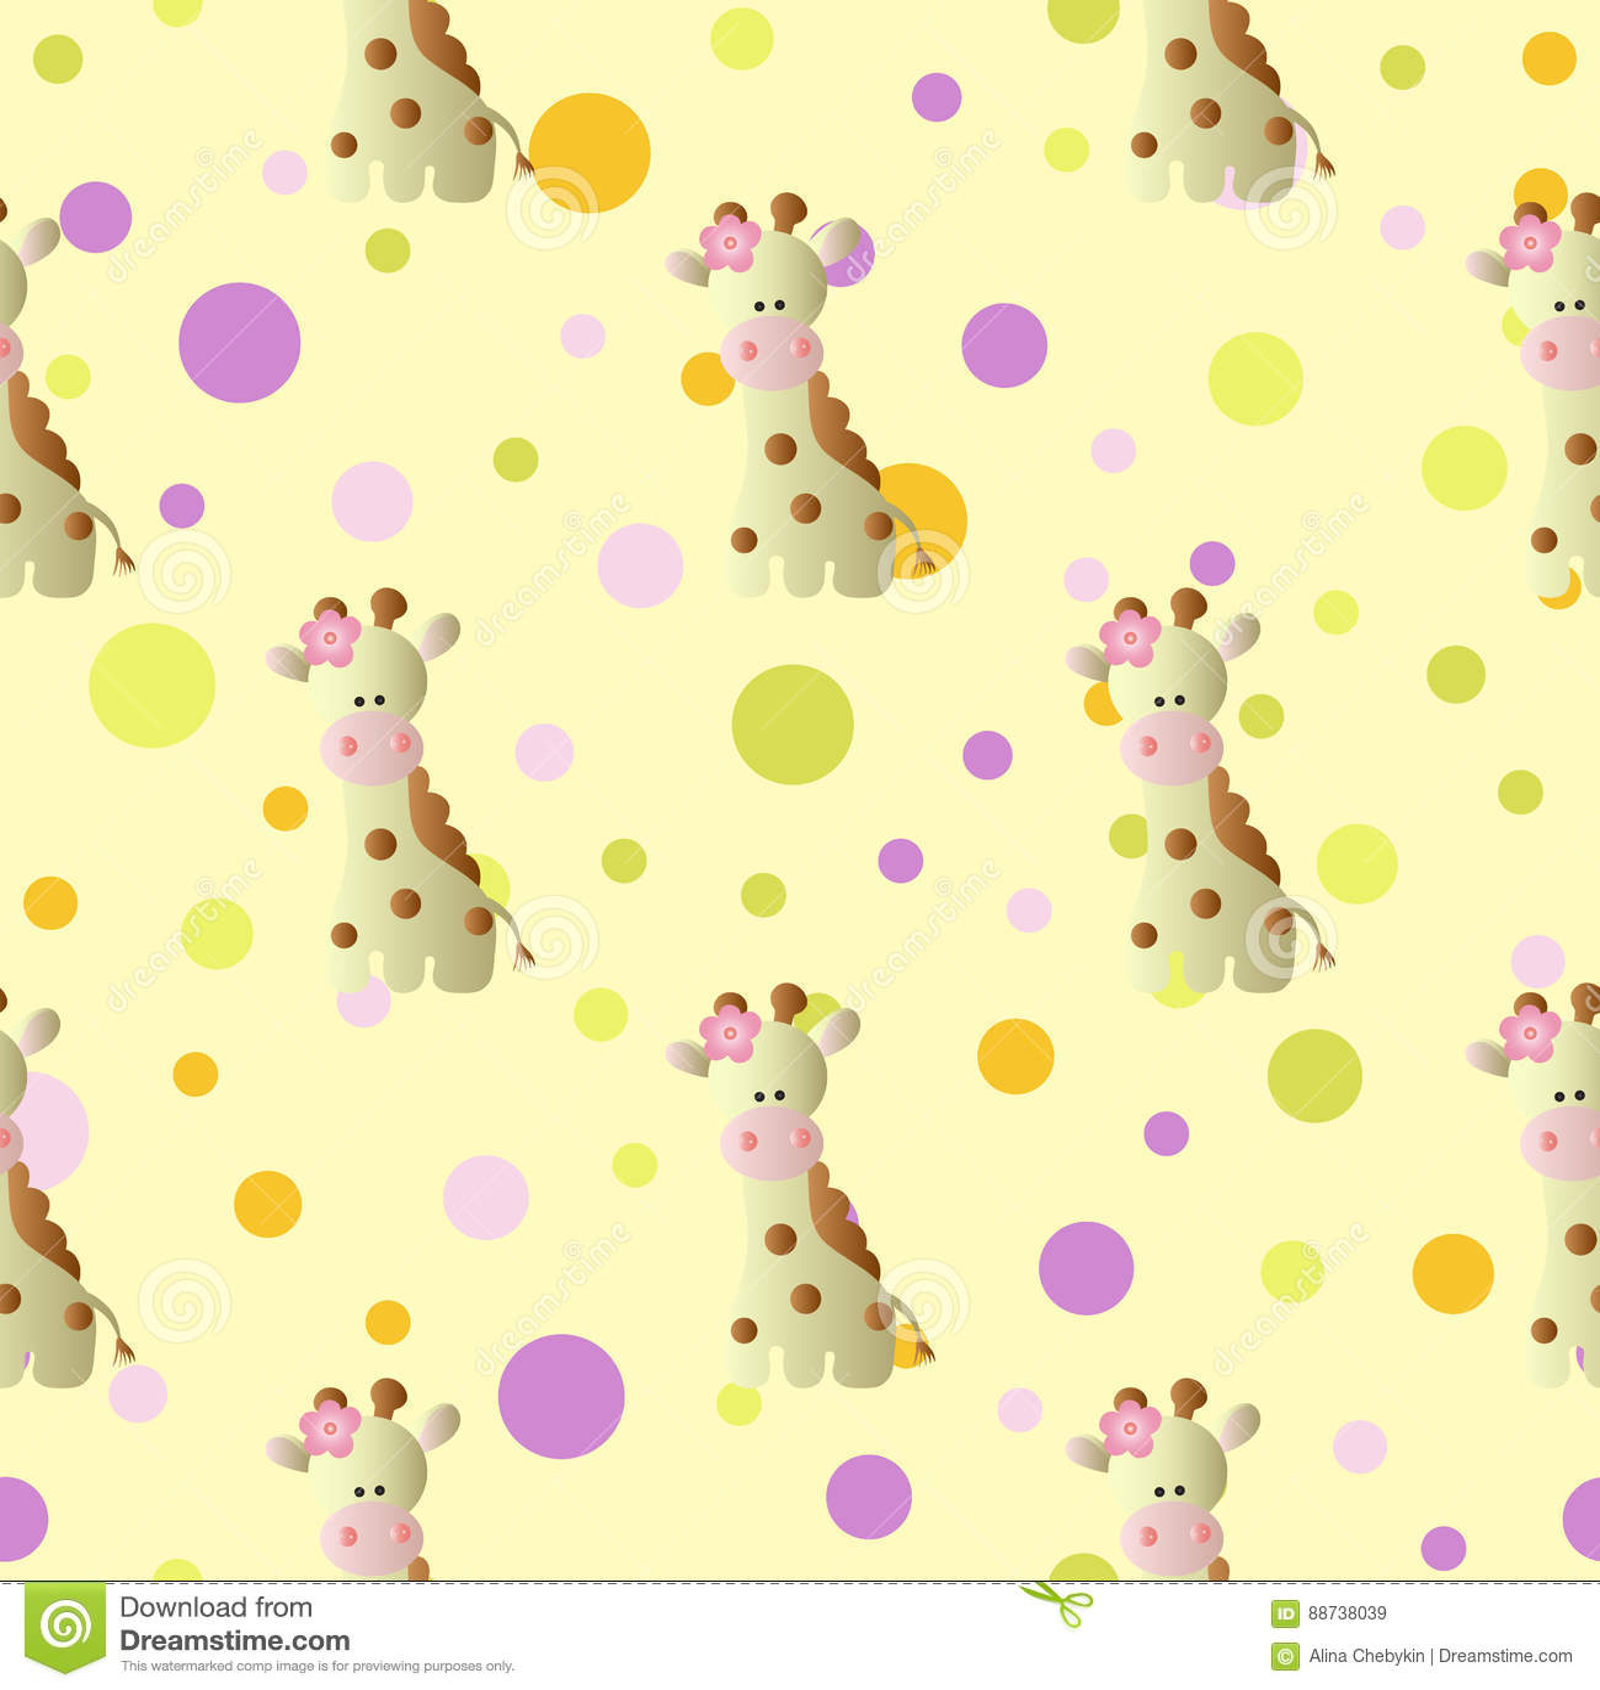 Pattern With Cartoon Cute Baby Giraffe And Circles Stock